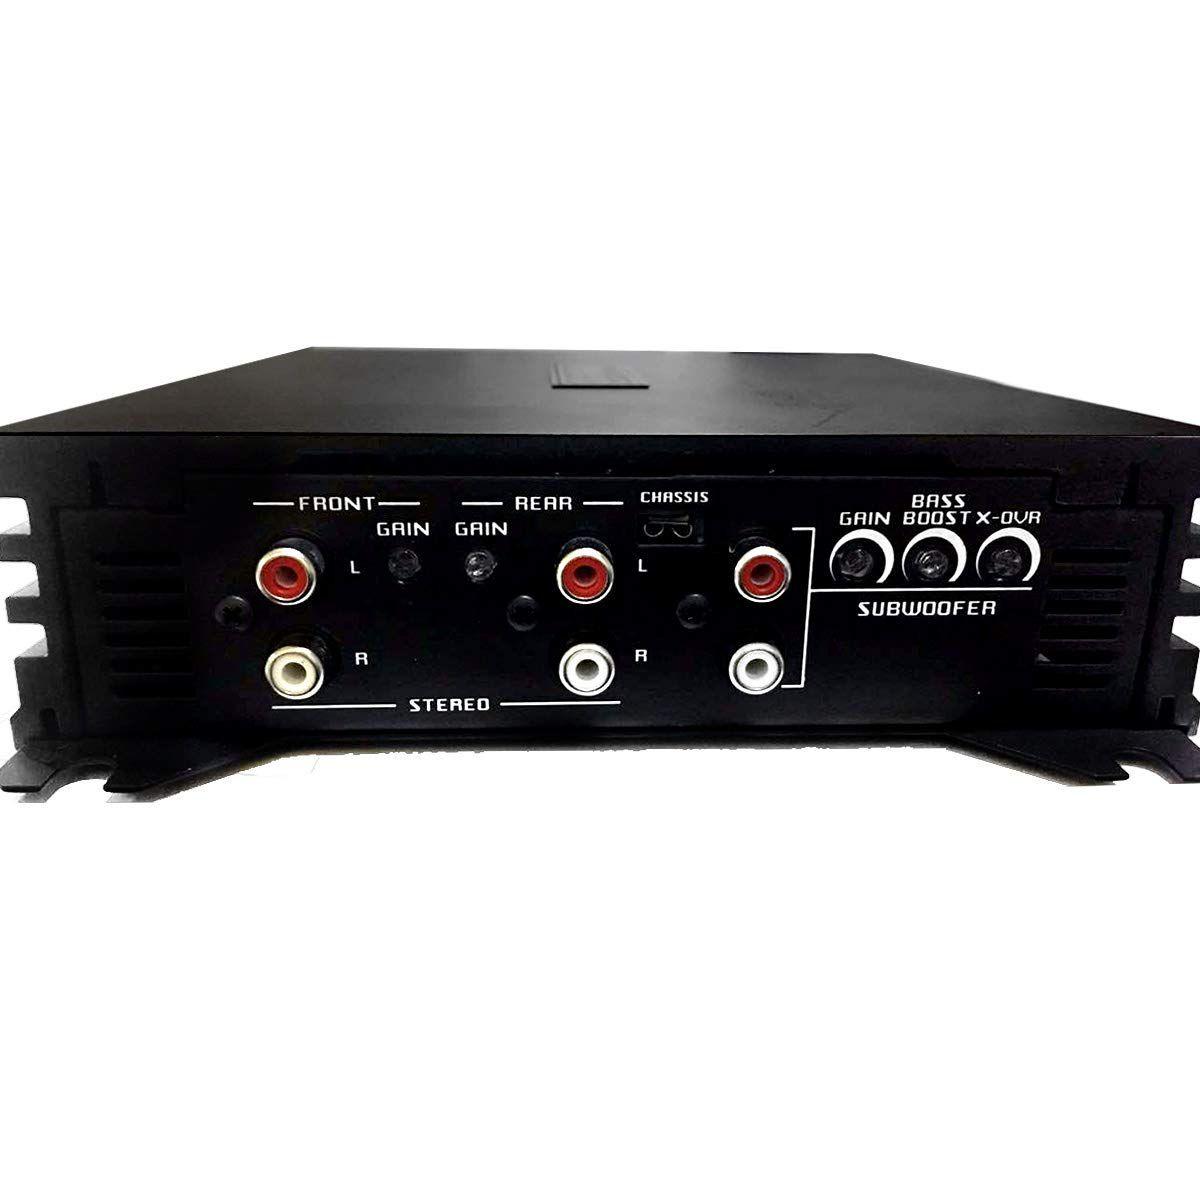 Modulo Amplificador Falcon 1200.5